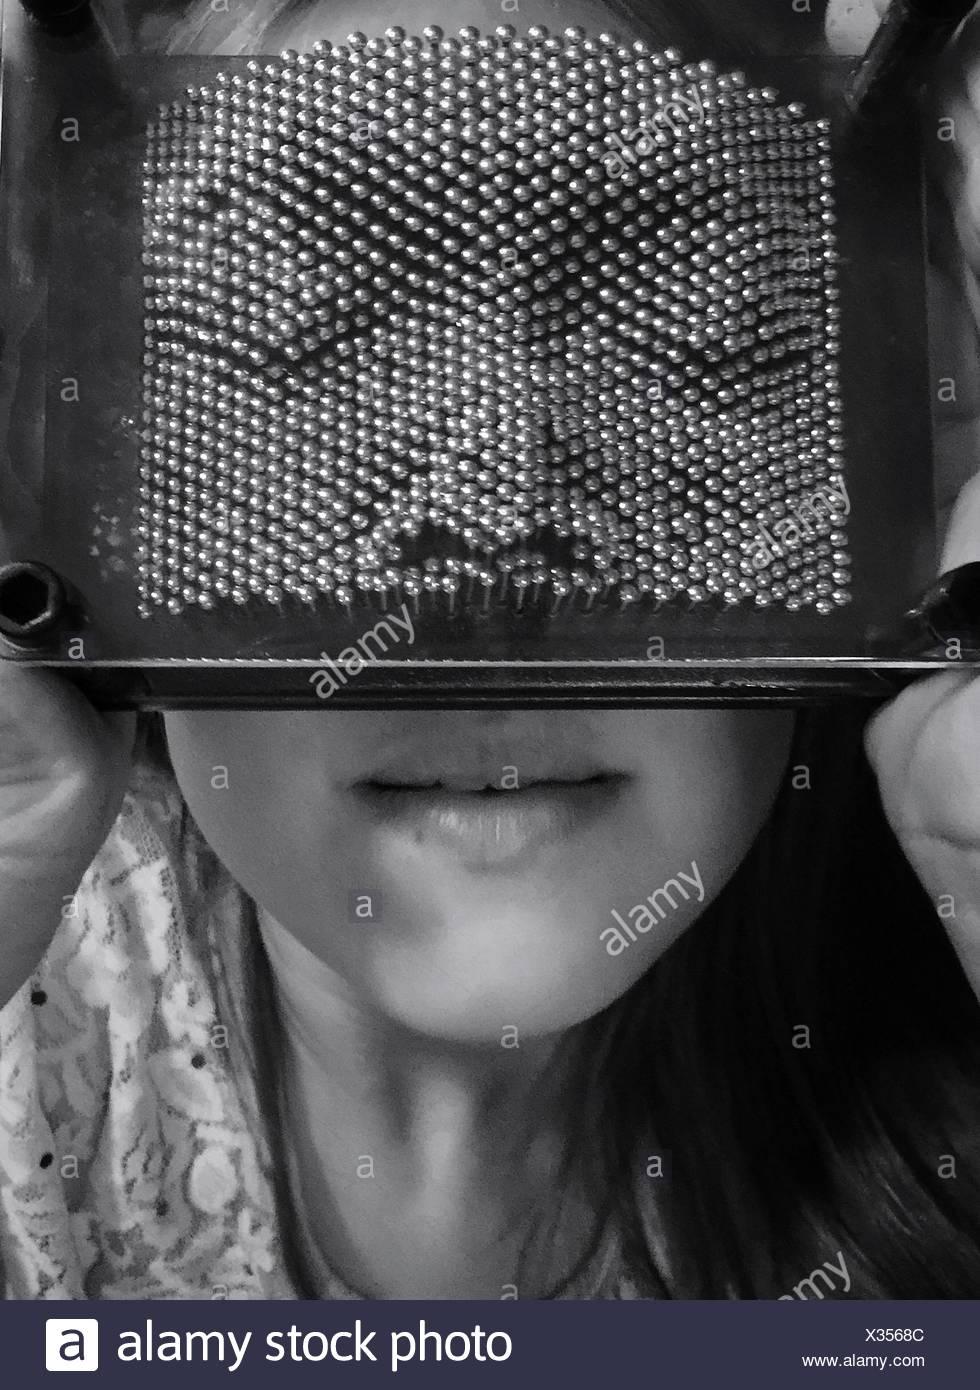 Close-Up Of Woman Wearing Pinhead - Stock Image